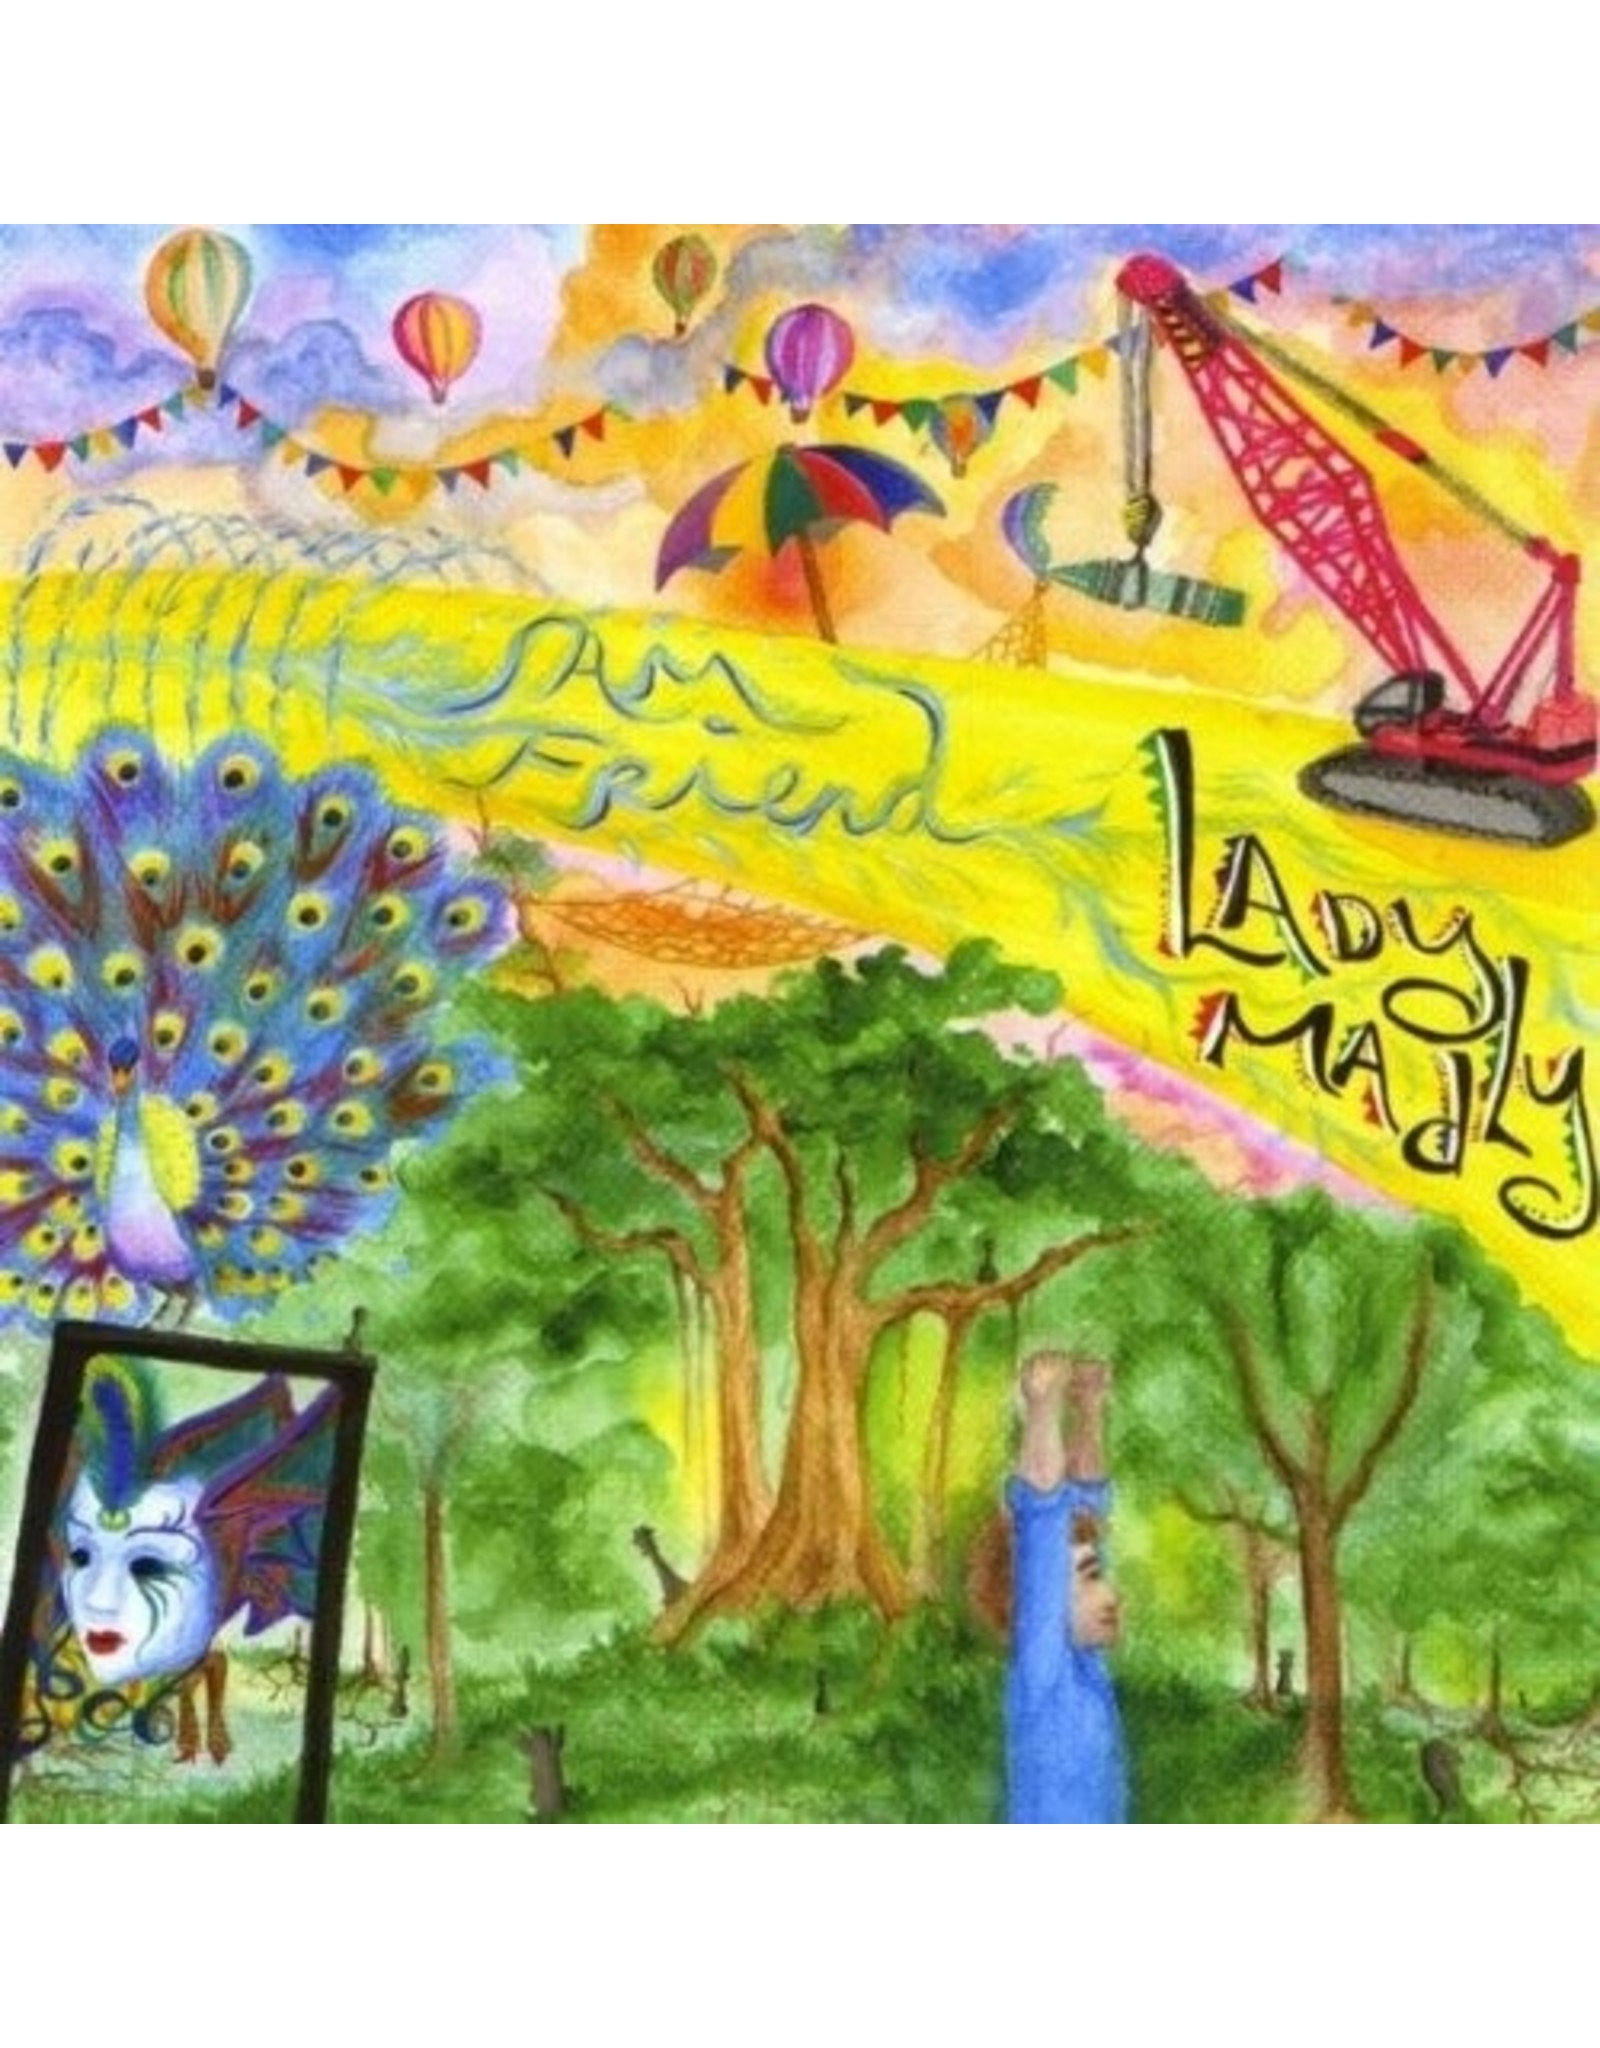 New Vinyl Sam Friend - Lady Madly LP